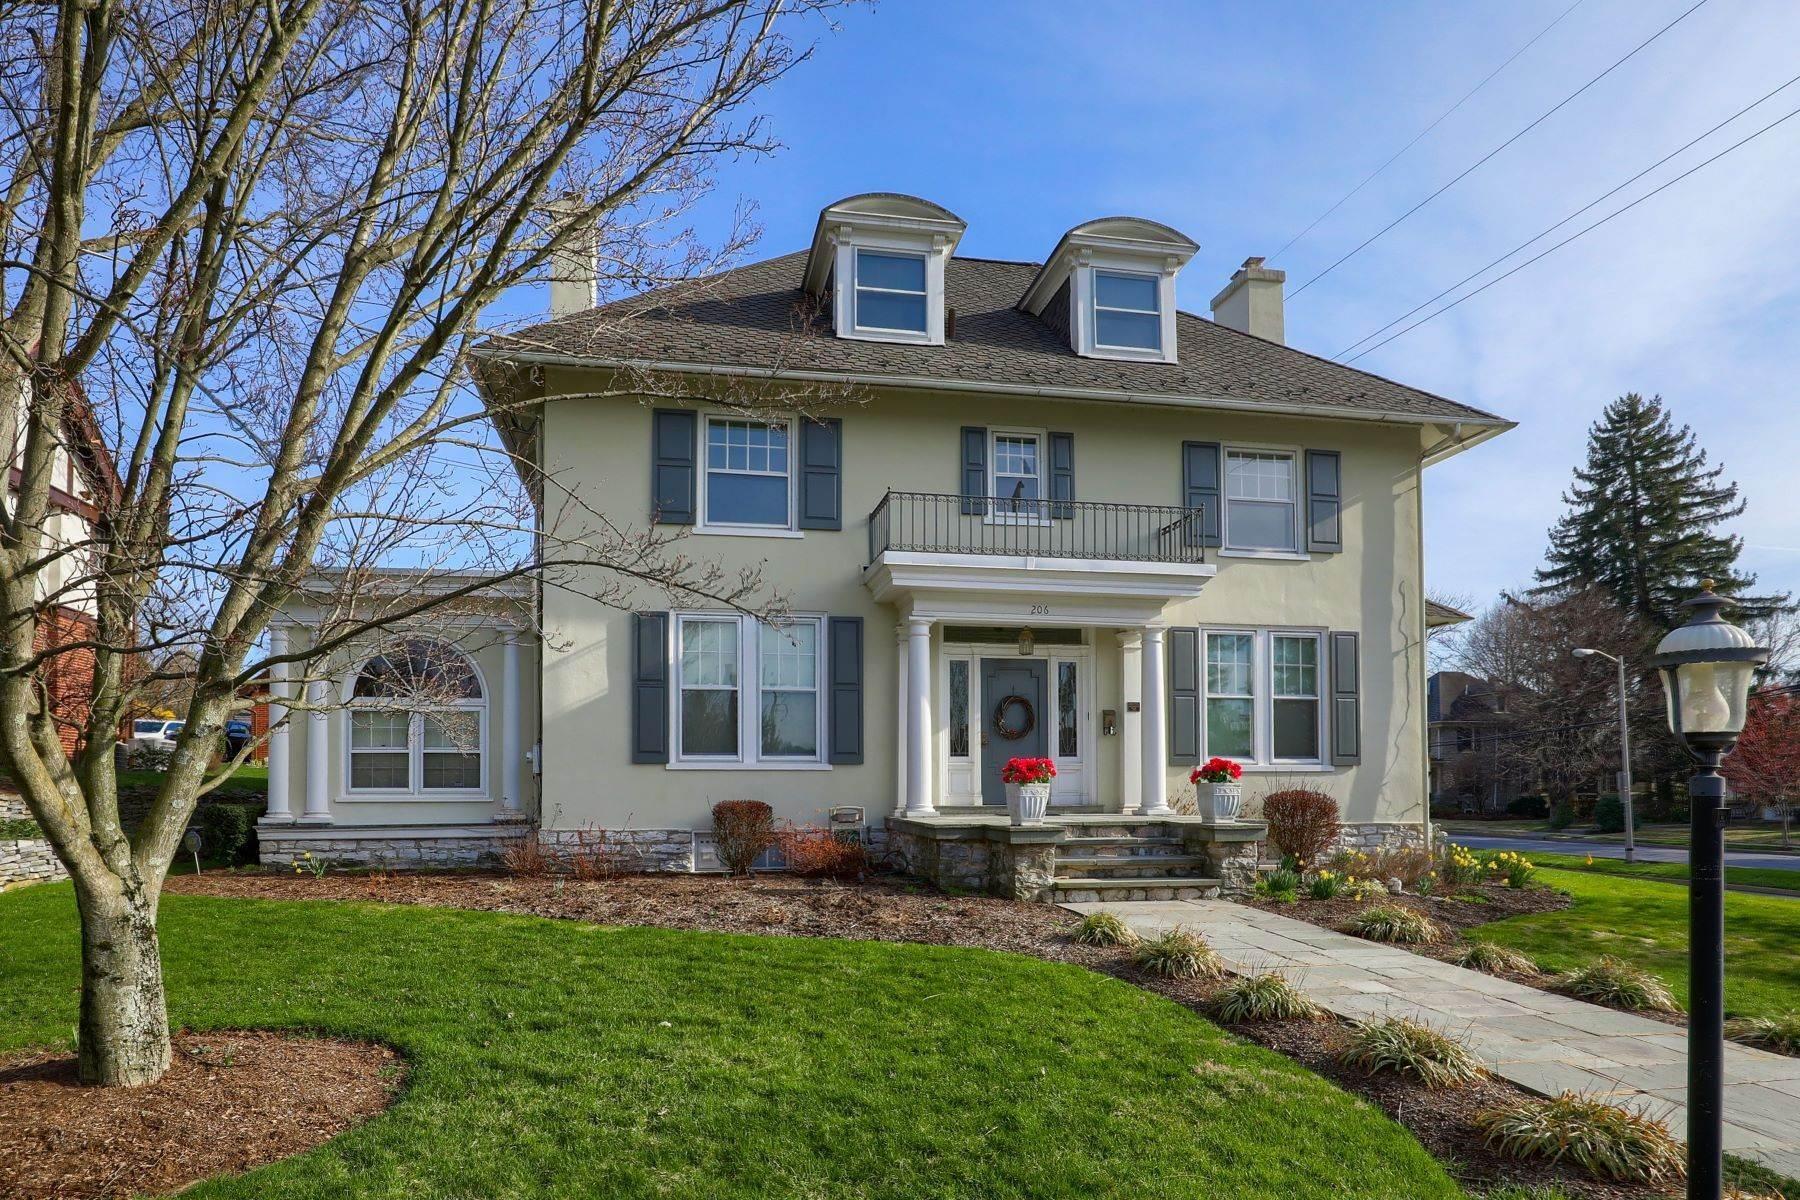 44. Single Family Homes for Sale at 206 E Granada Ave Hershey, Pennsylvania 17033 United States